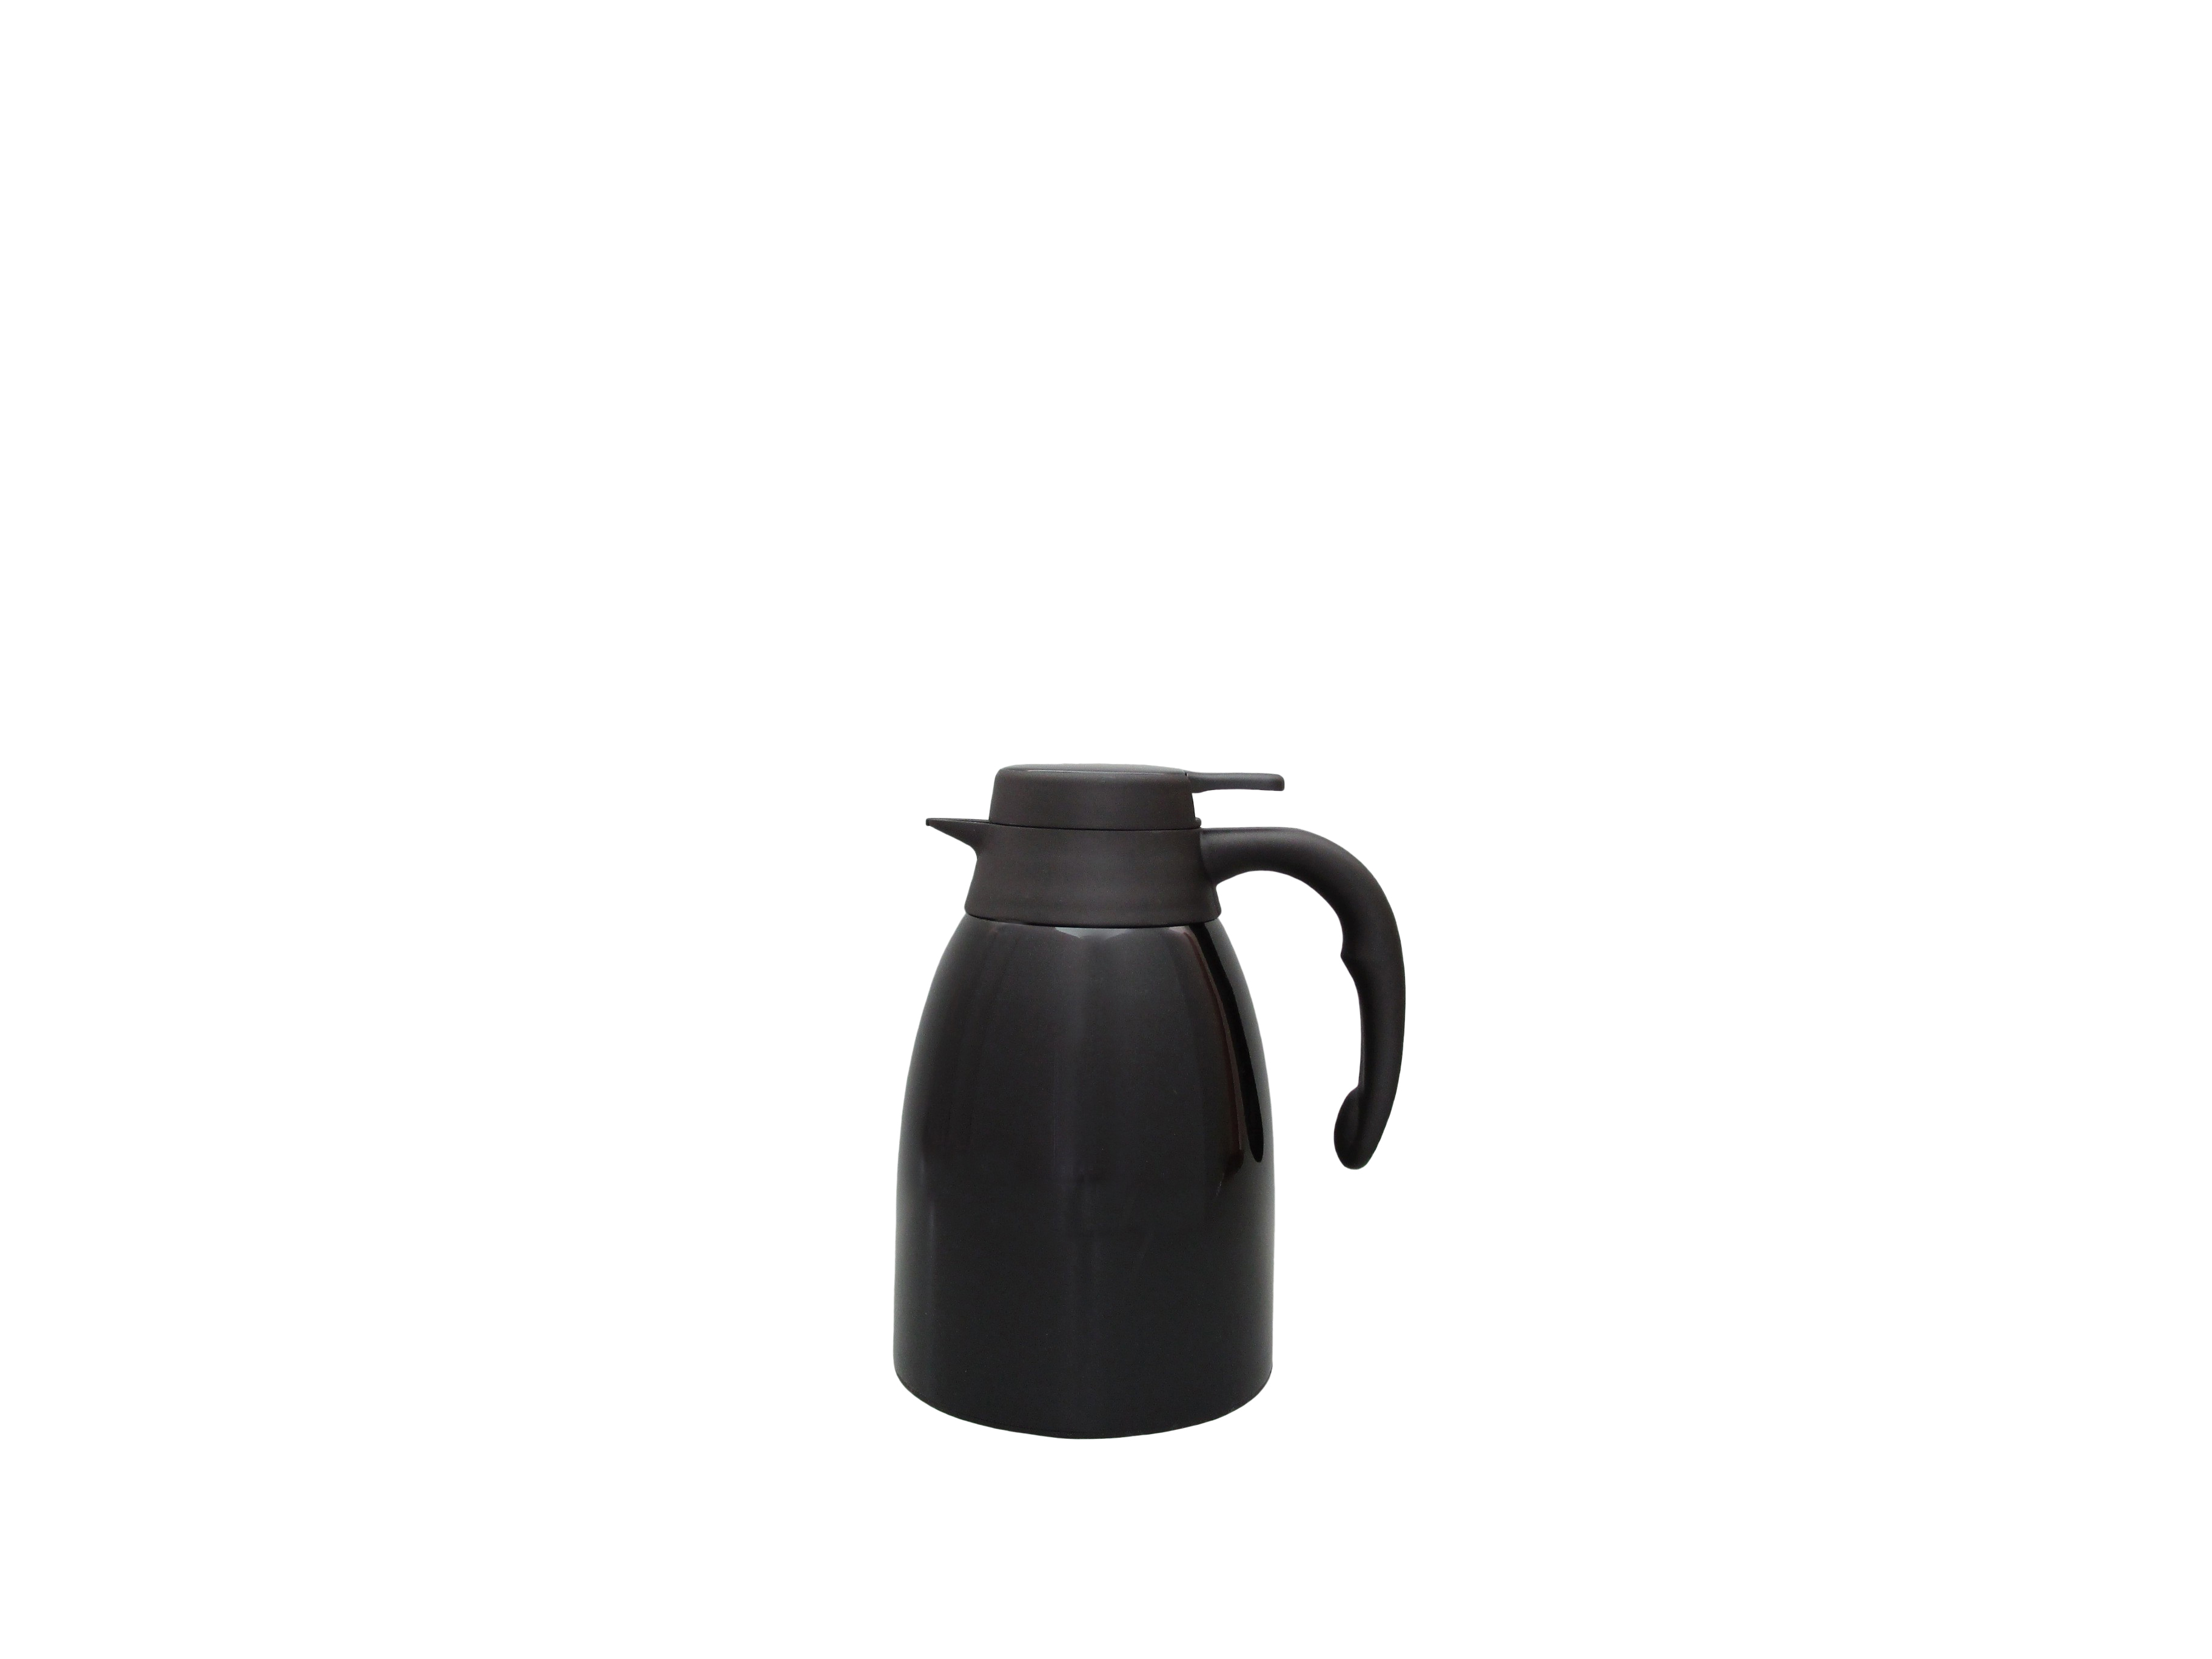 FUJI15-002 - Vacuum carafe SS black unbreakable 1.5 L - Isobel